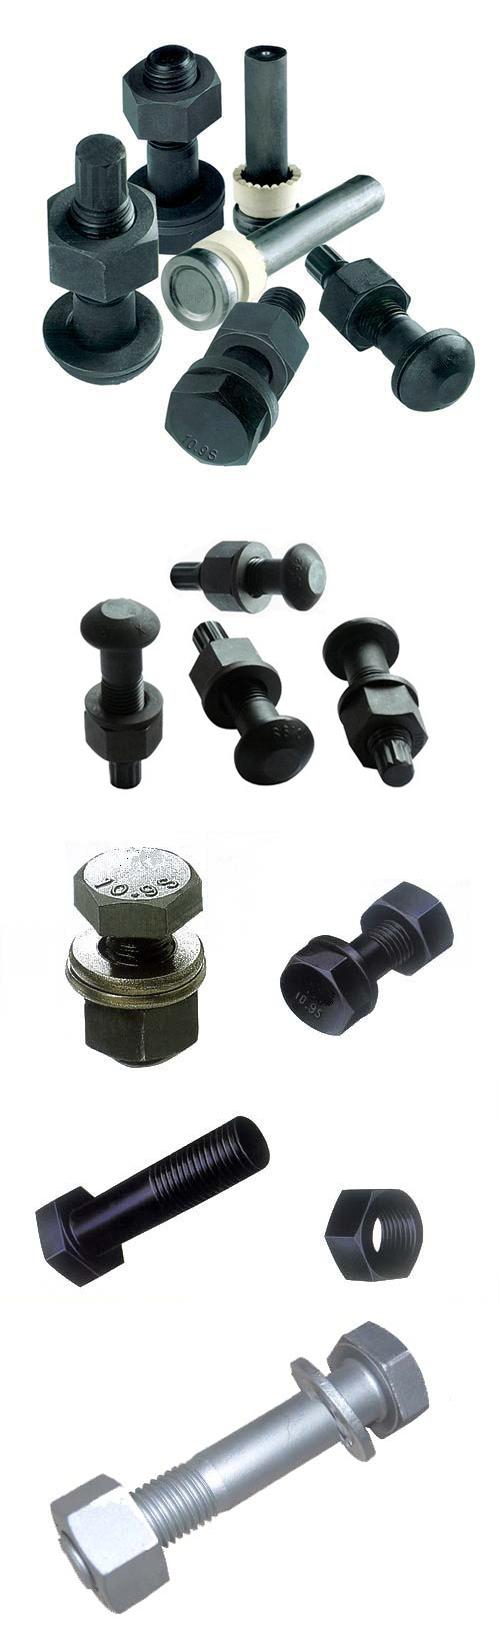 ASTM A490 Structural Bolt, Alloy Steel, 150ksi Minimum Tensile Strength